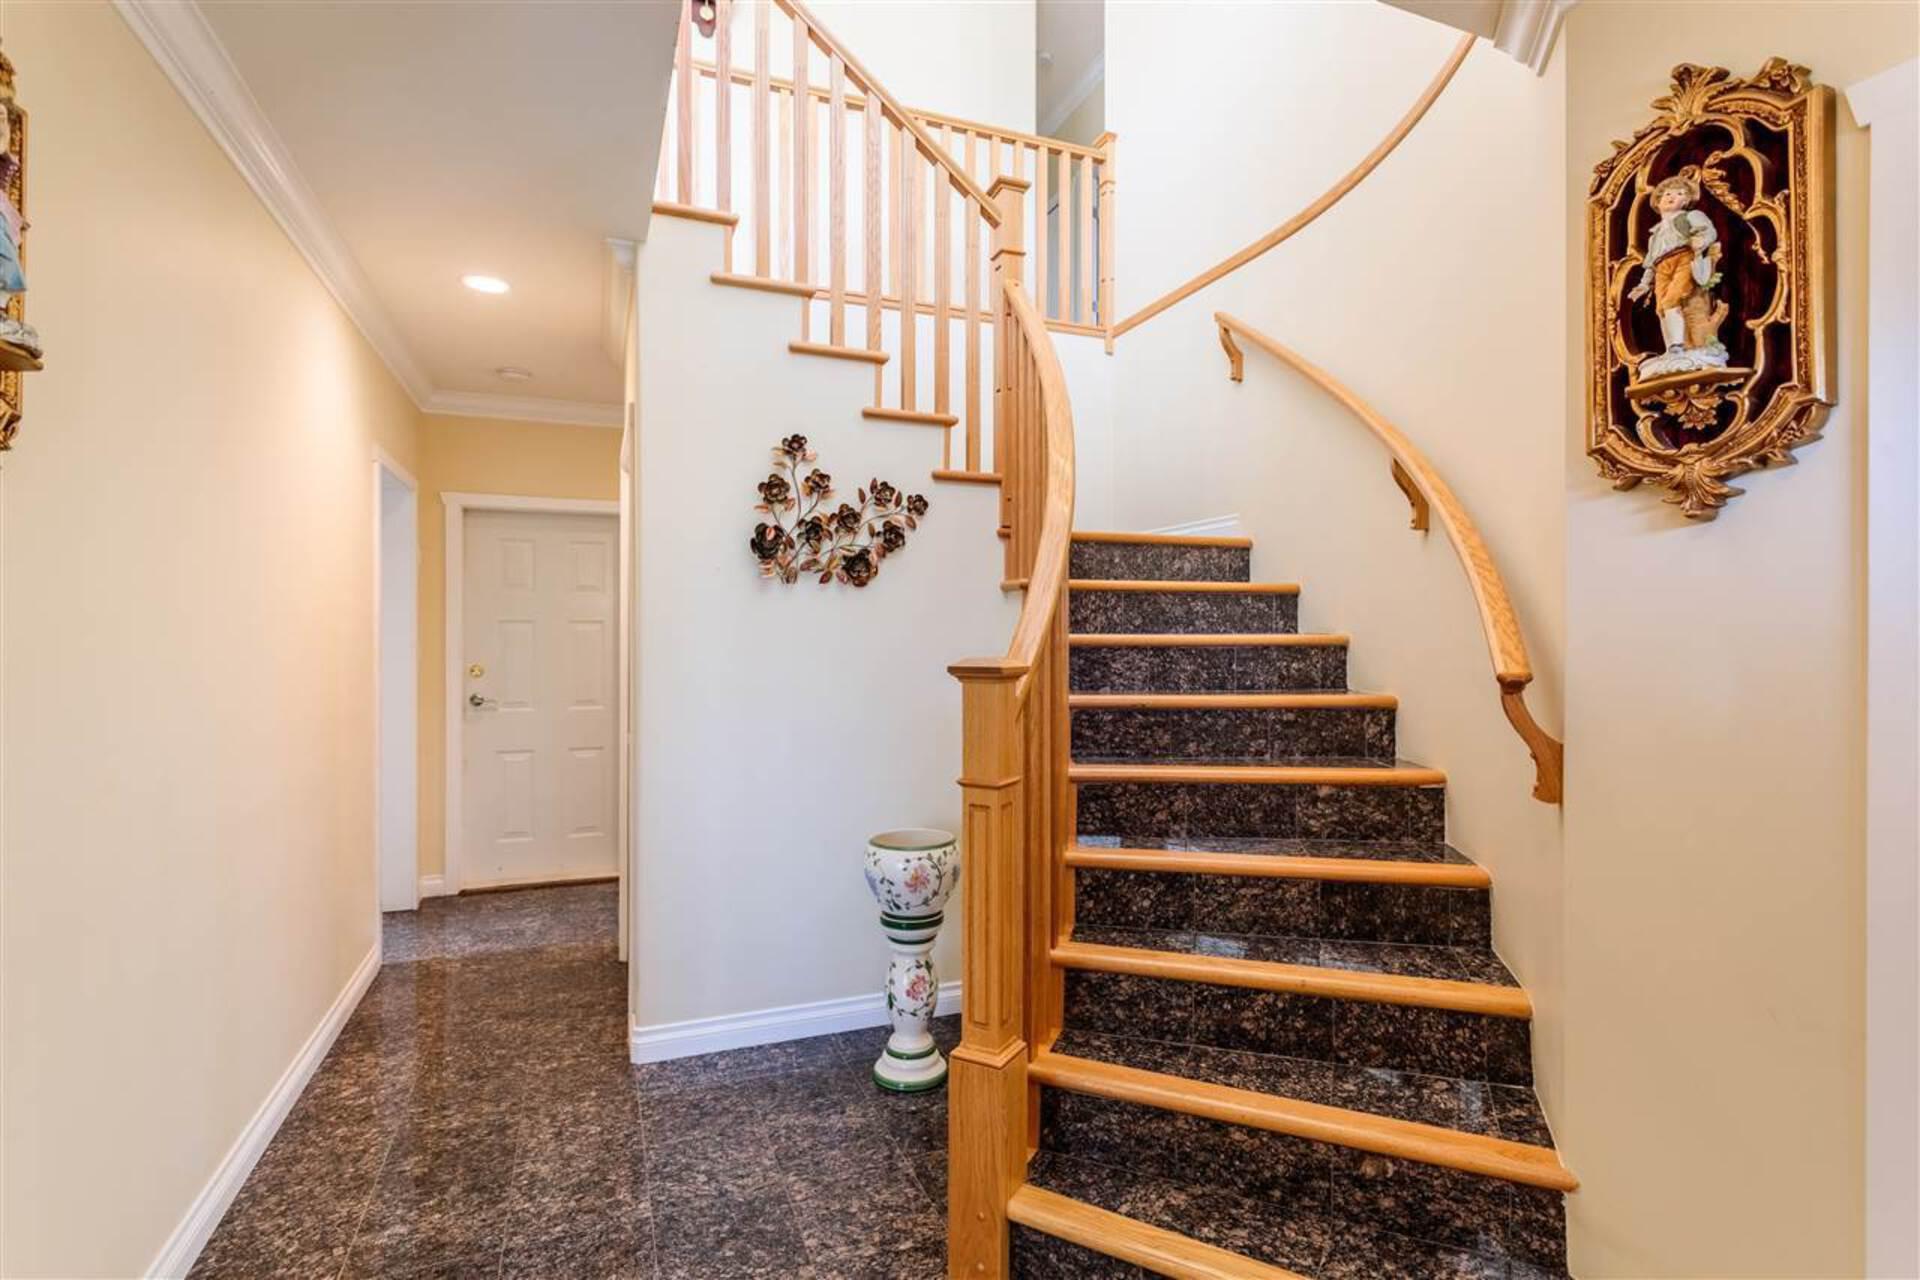 4015-frances-street-willingdon-heights-burnaby-north-02 at 4015 Frances Street, Willingdon Heights, Burnaby North